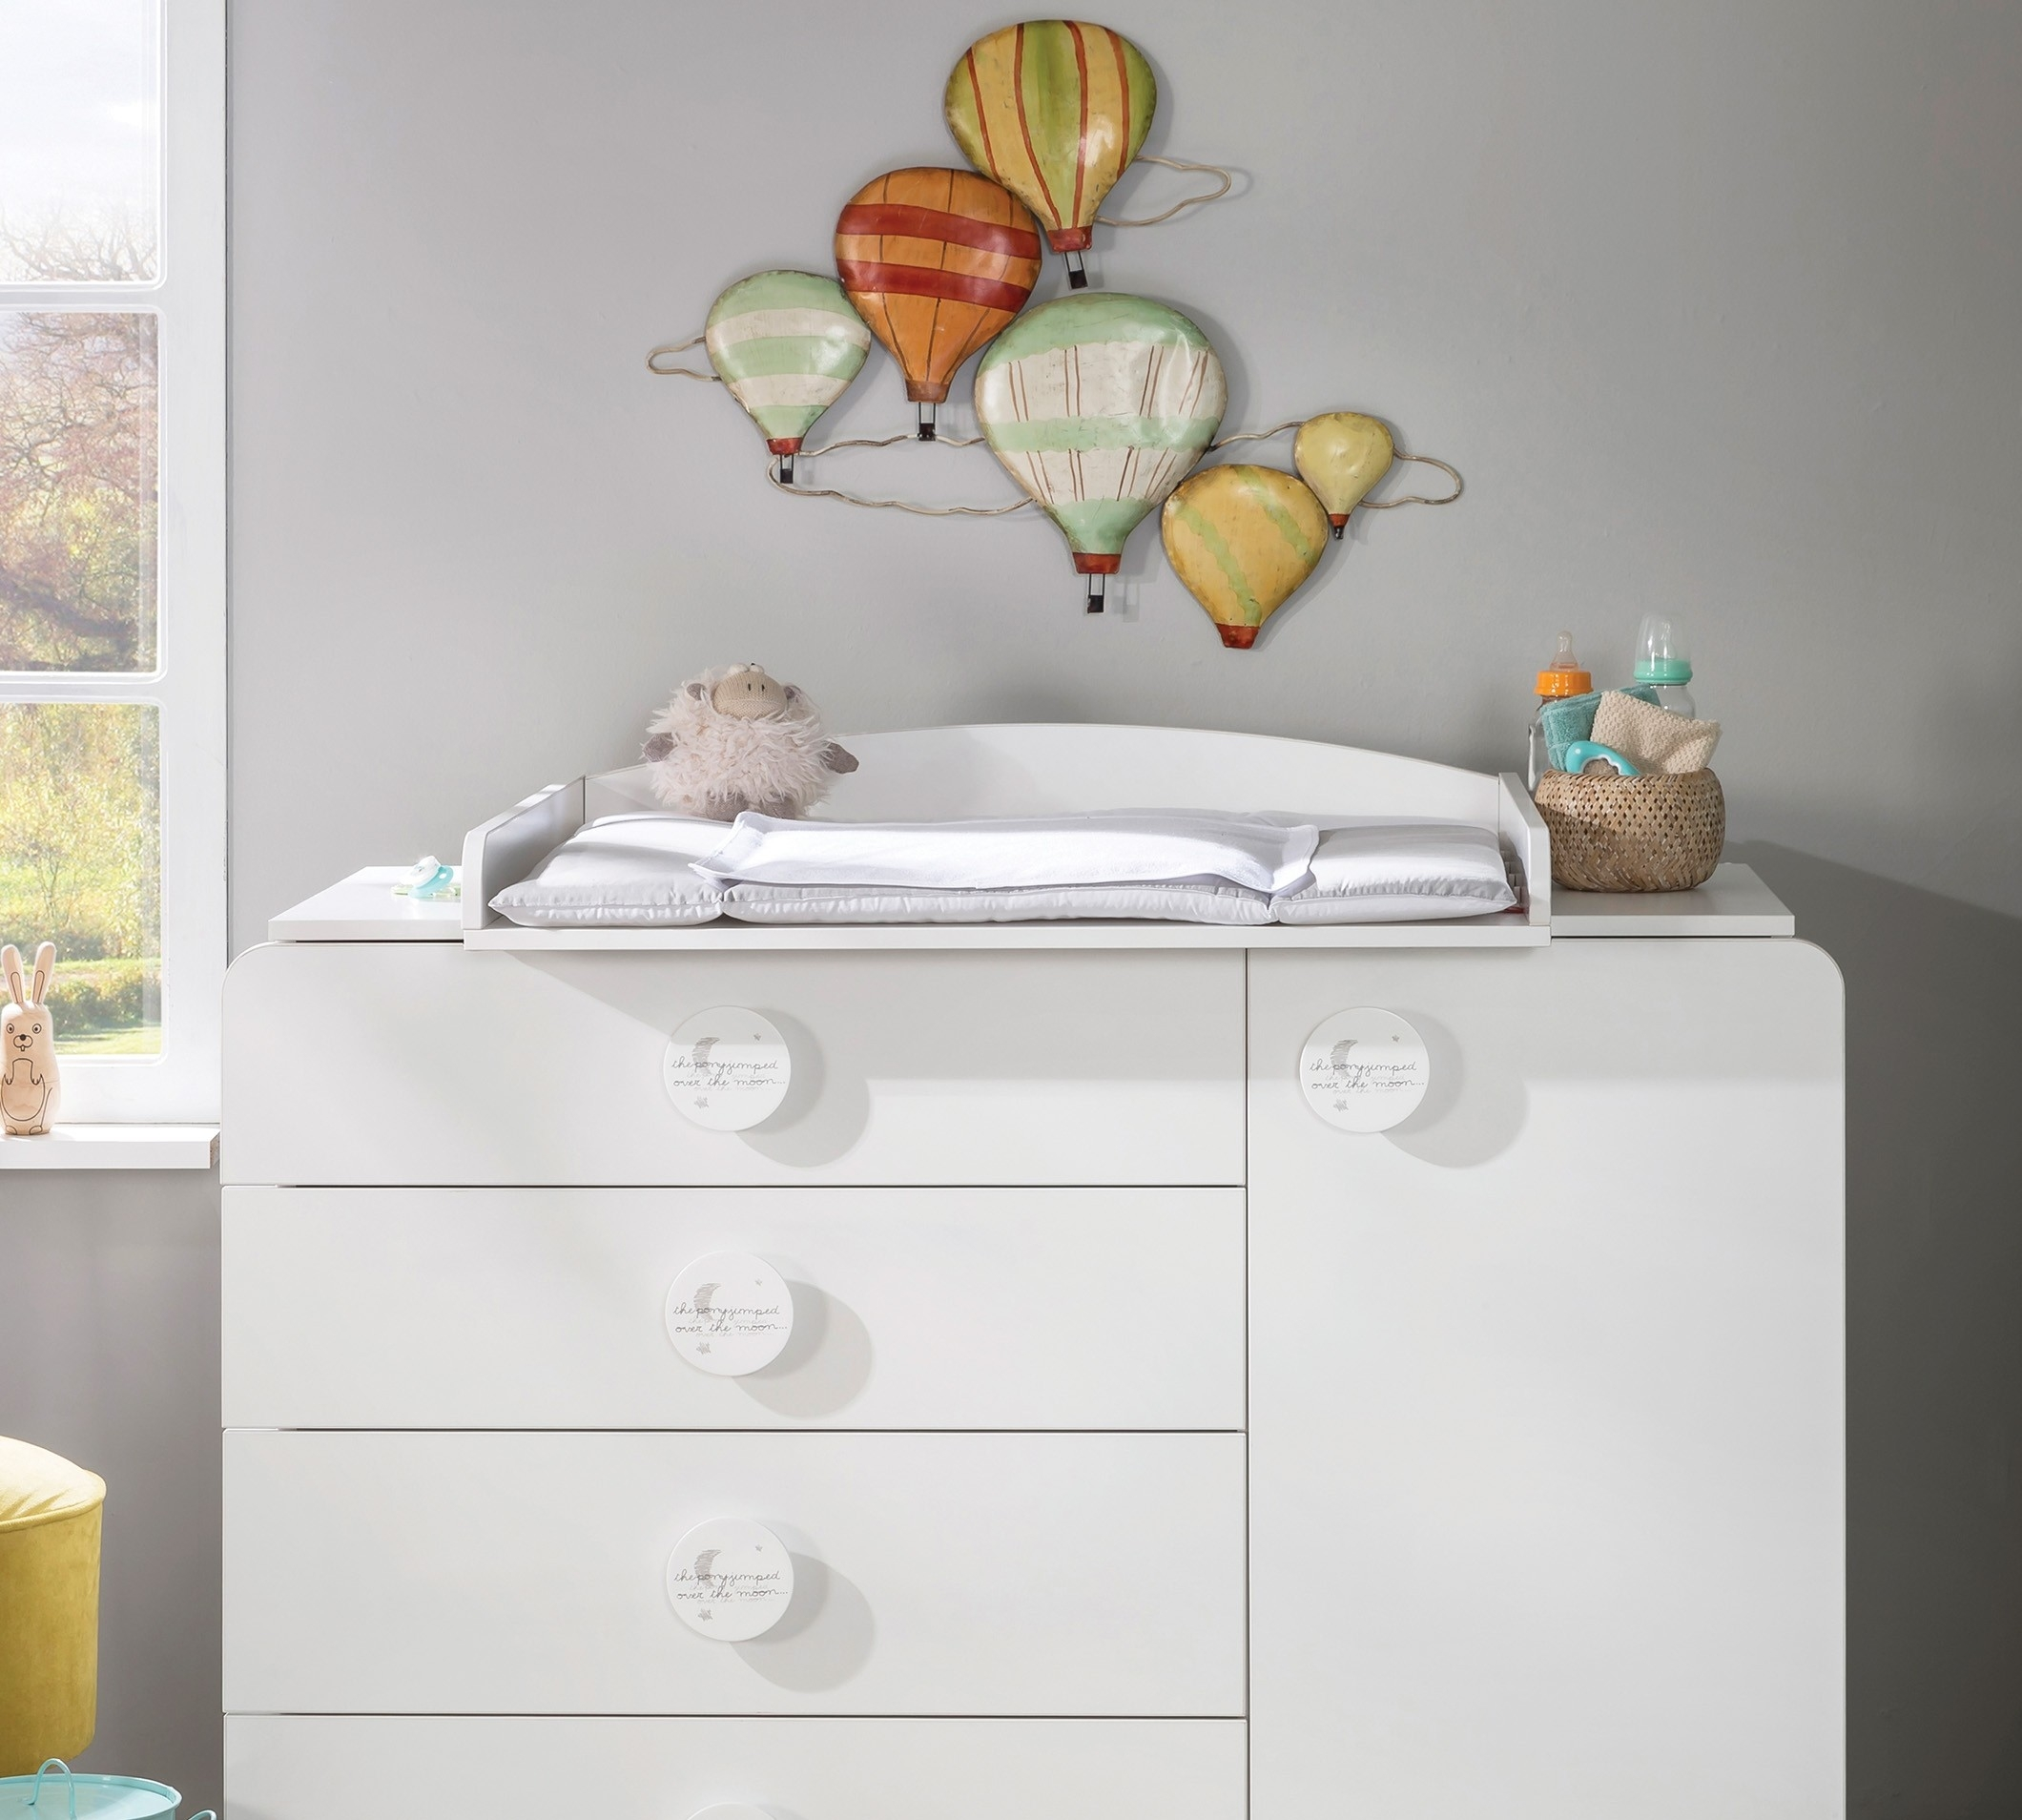 Masa de infasat din pal transformabila in etajera, pentru bebe Baby Cotton White, l82xA74xH13 cm din categoria Mobiler copii